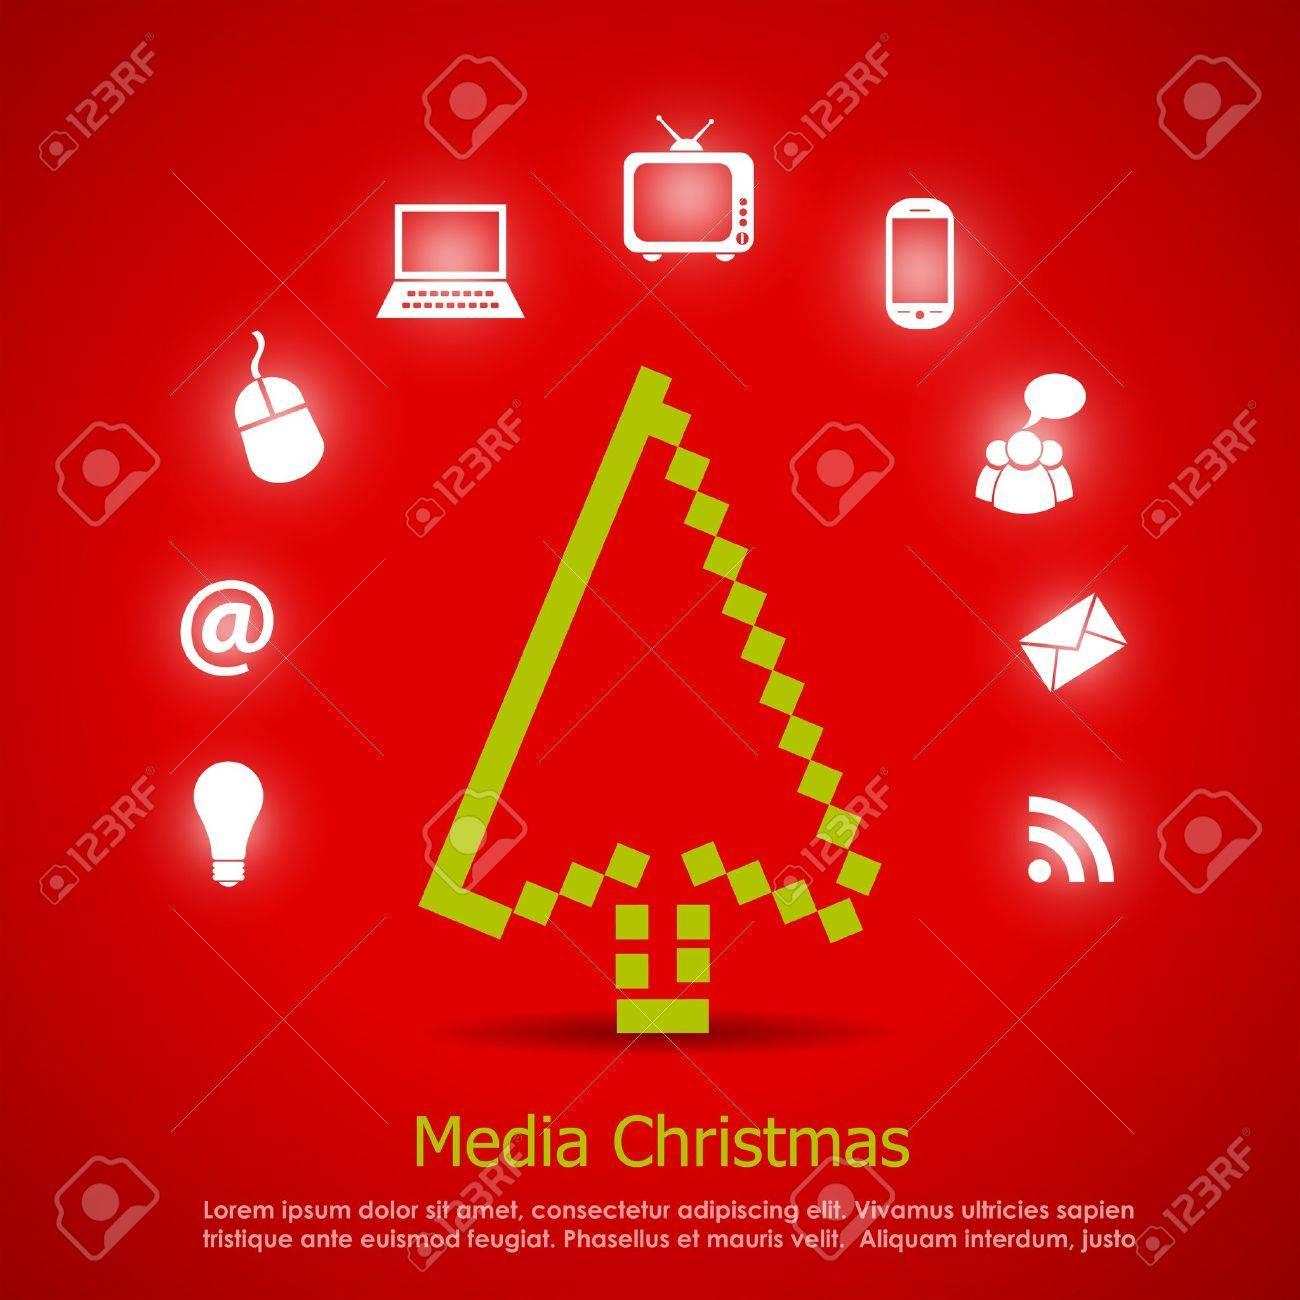 Media christmas vector card Stock Vector - 16145629